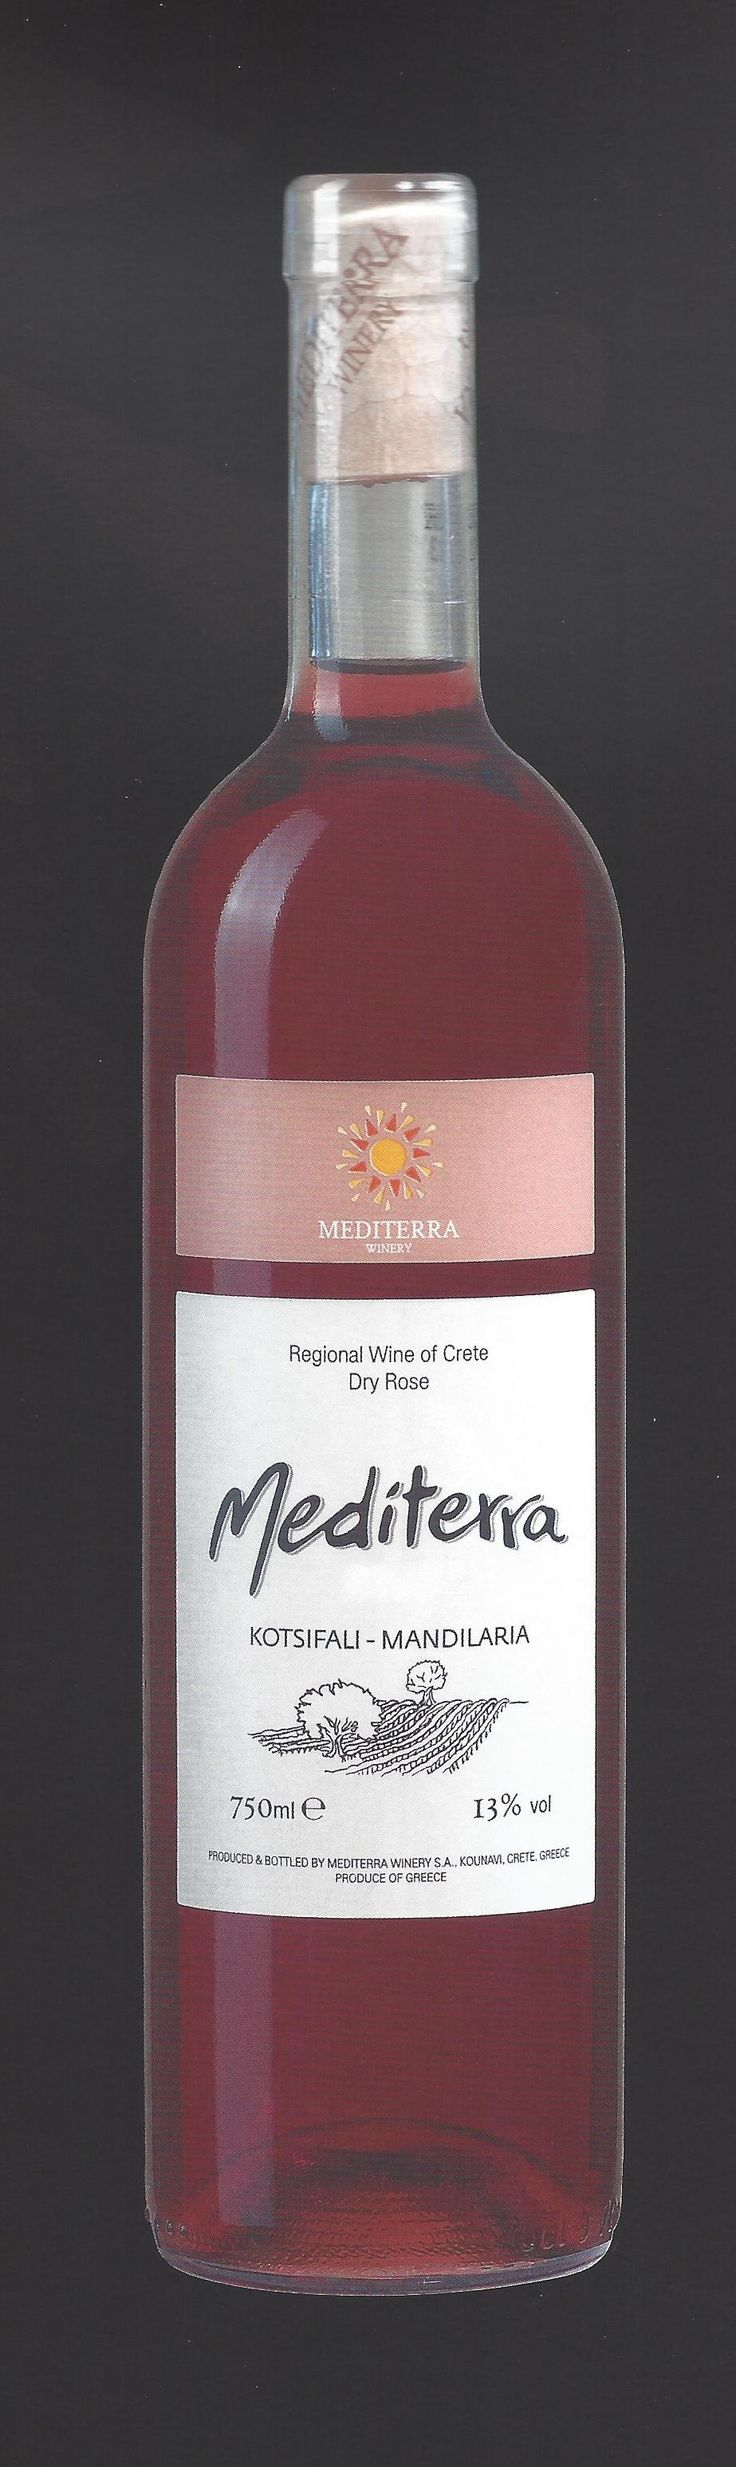 #Mediterra #Nexln #Wine of #Crete